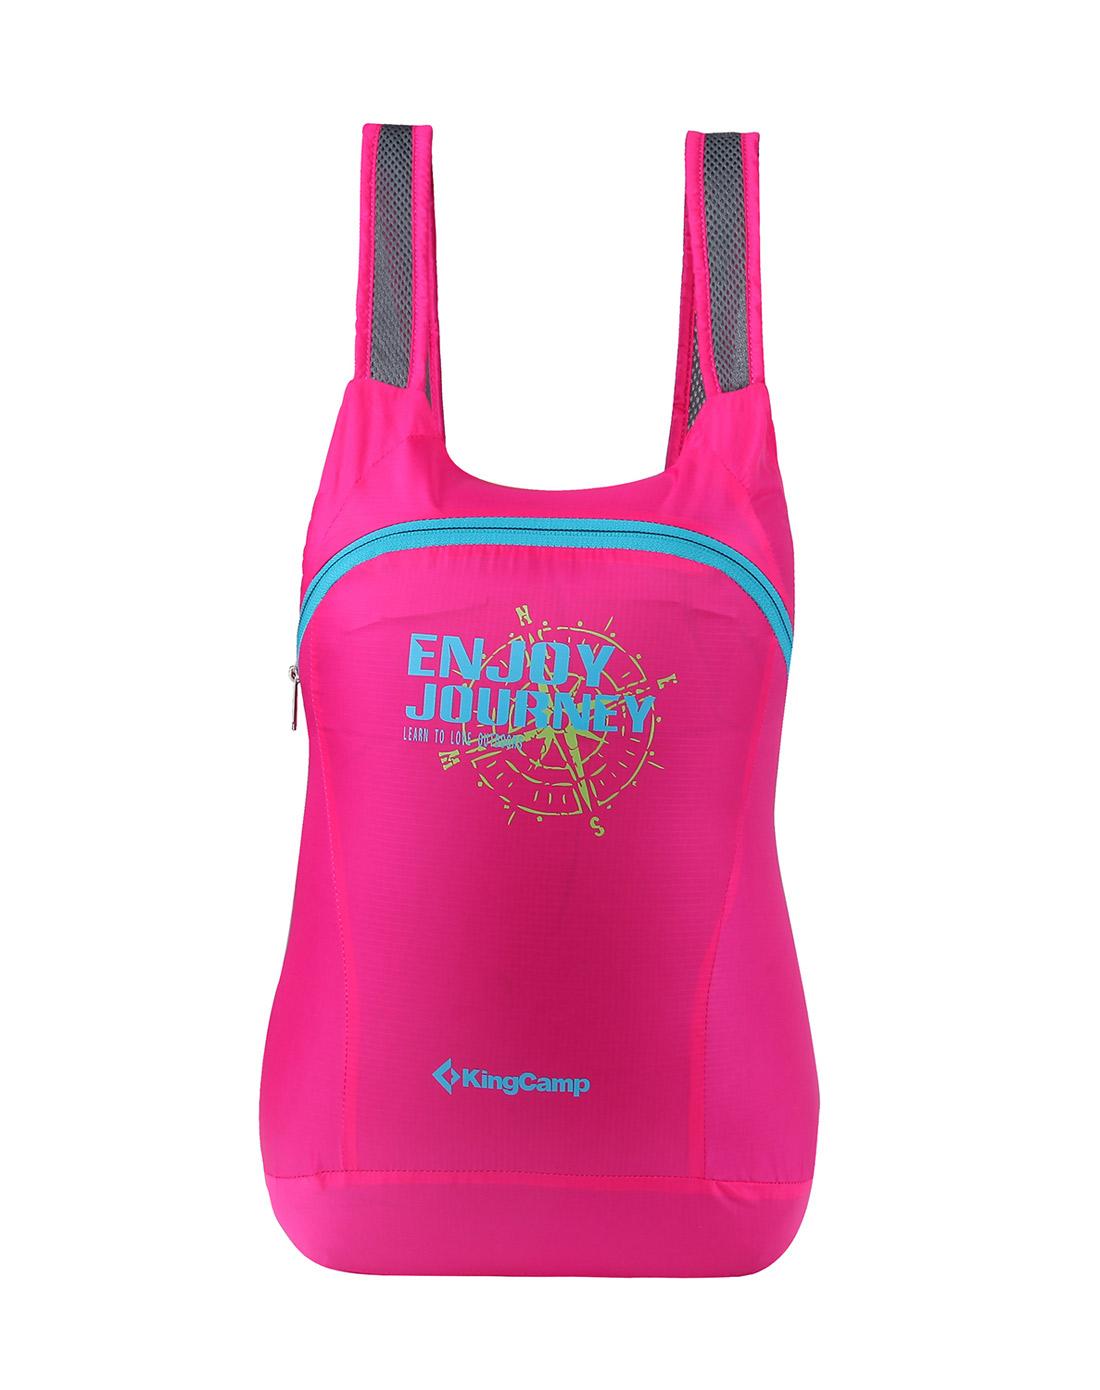 Рюкзак King campРюкзаки<br>Назначение рюкзака: городской, Тип конструкции: мягкий, Тип: рюкзак, Объем: 12, Число лямок: 2, Материал: полиэстер, Цвет: розовый<br>